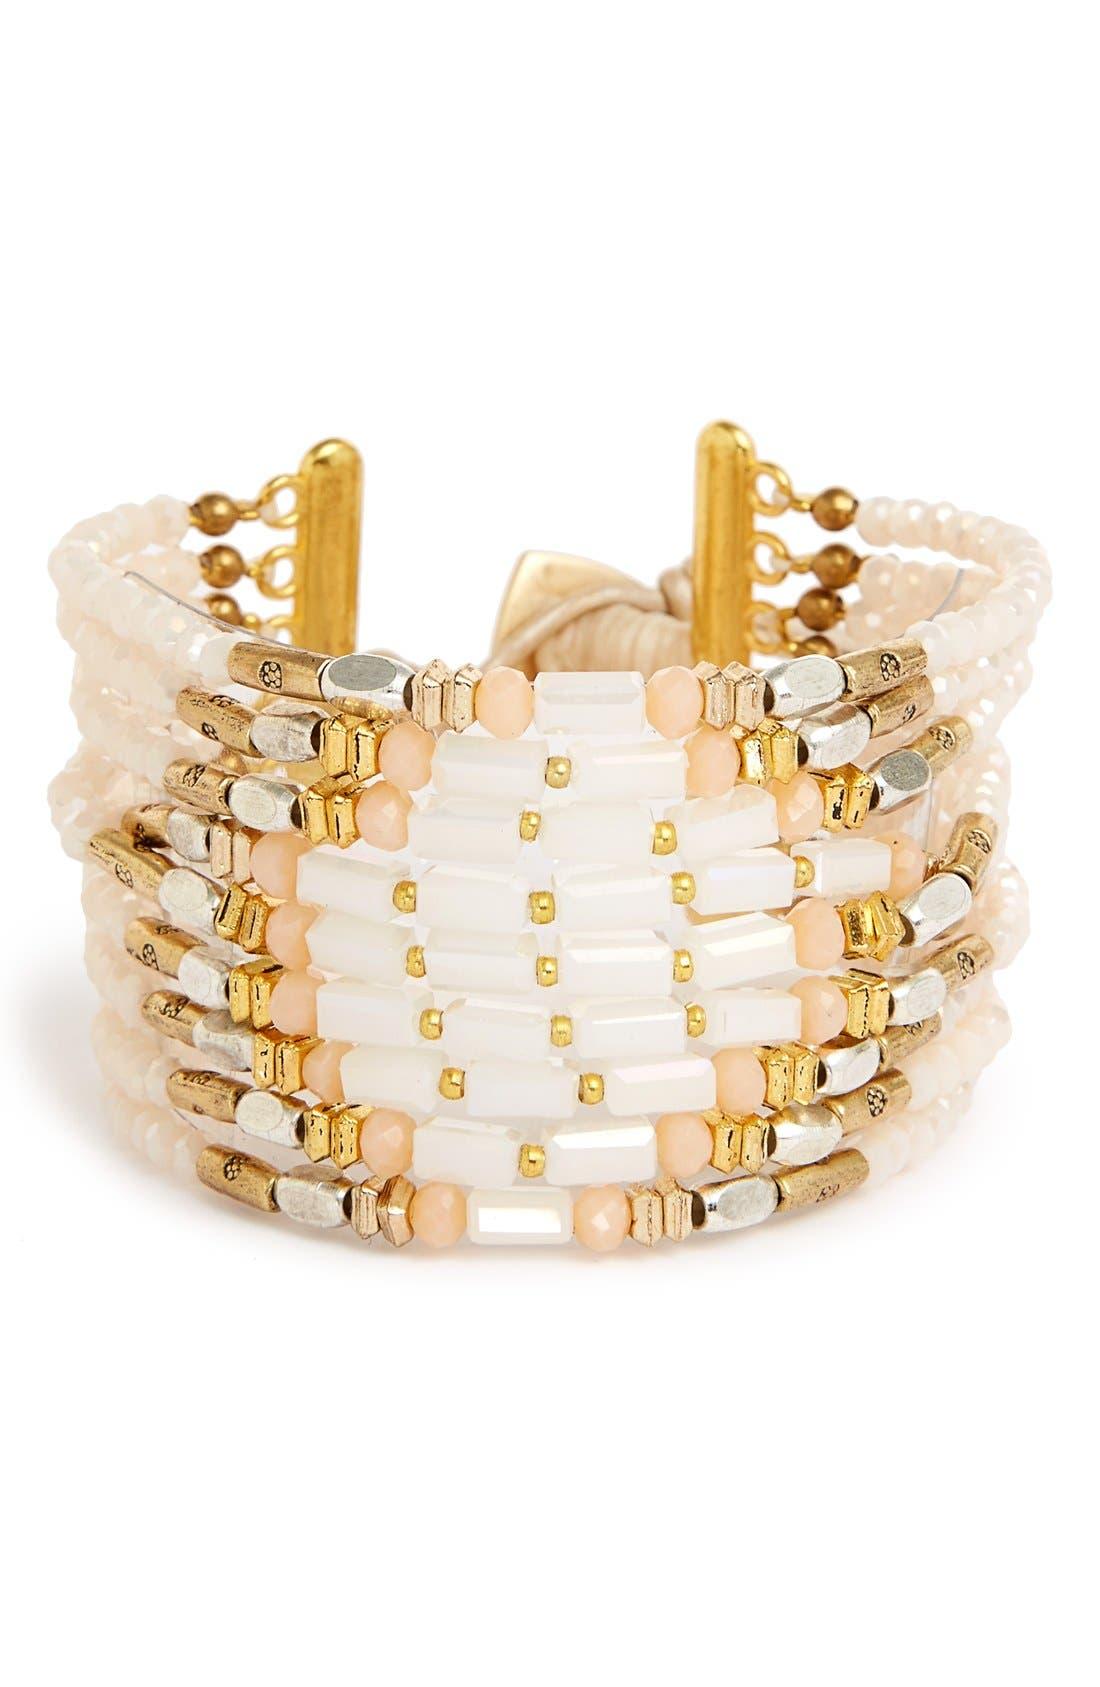 Main Image - Nakamol Design Beaded Bracelet Cuff